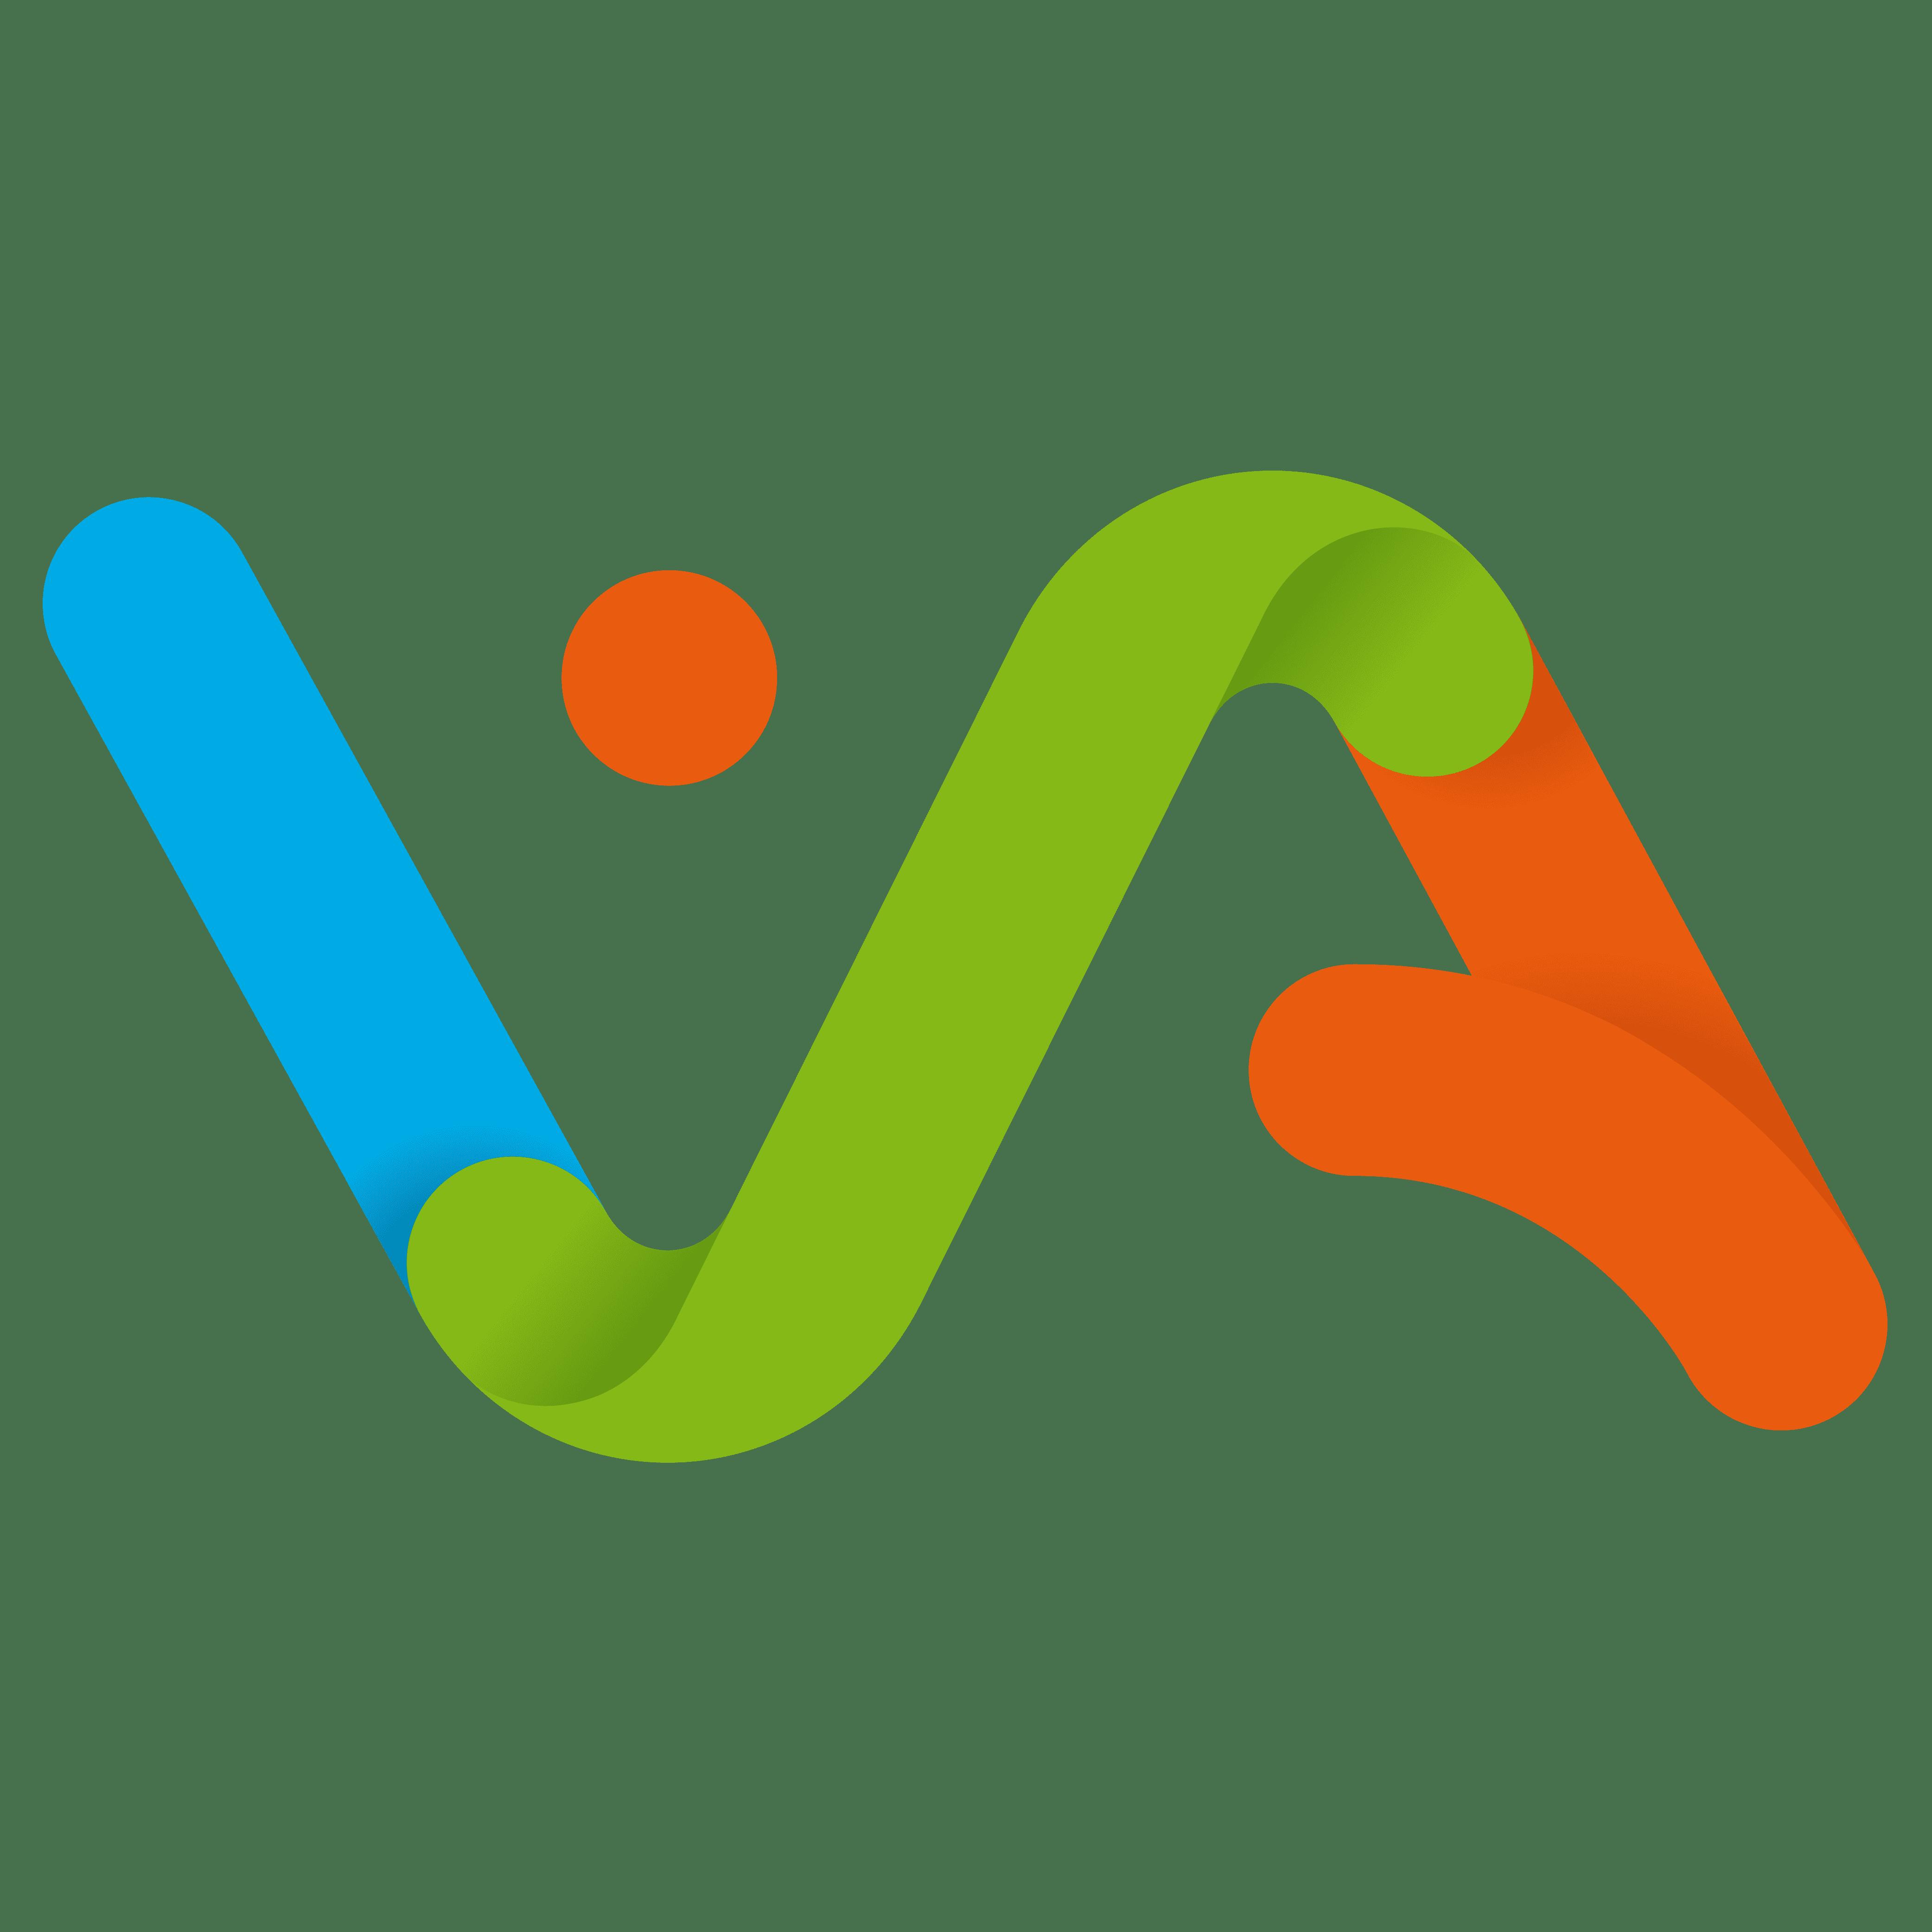 logo vallée de saint-amarin